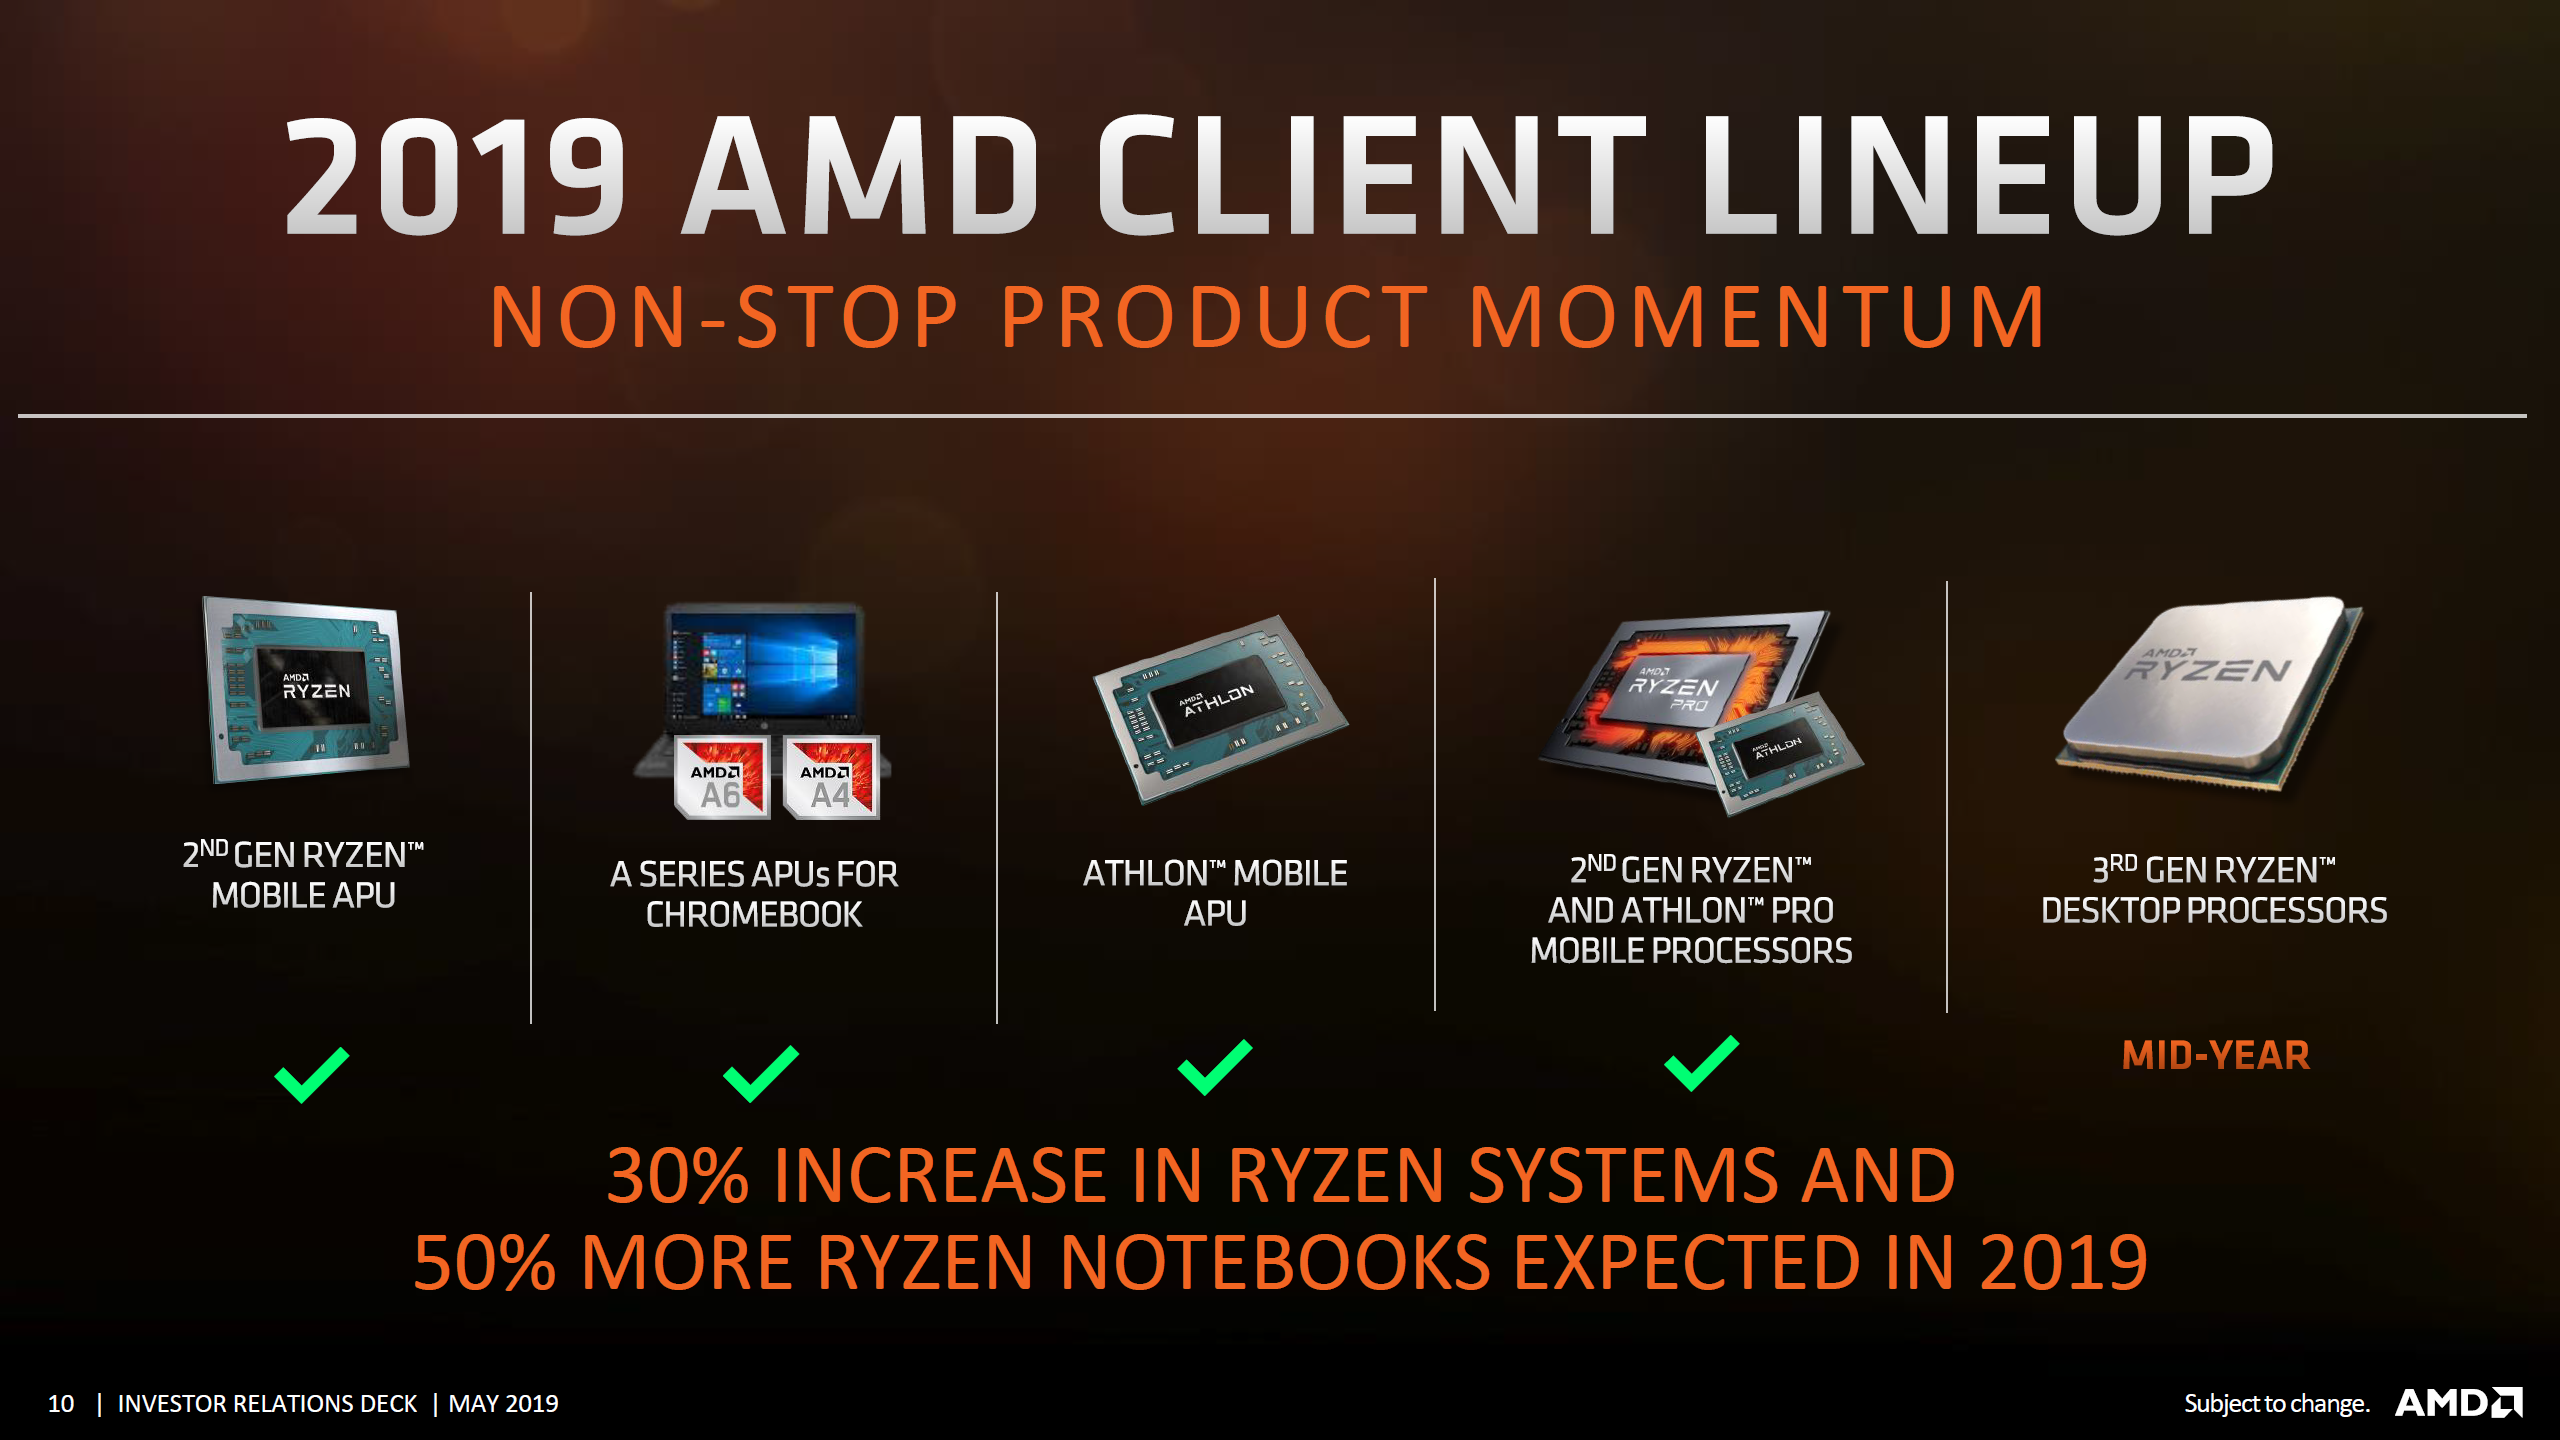 AMD Ryzen 3000, EPYC Rome & Radeon Navi Confirmed For Q3 2019